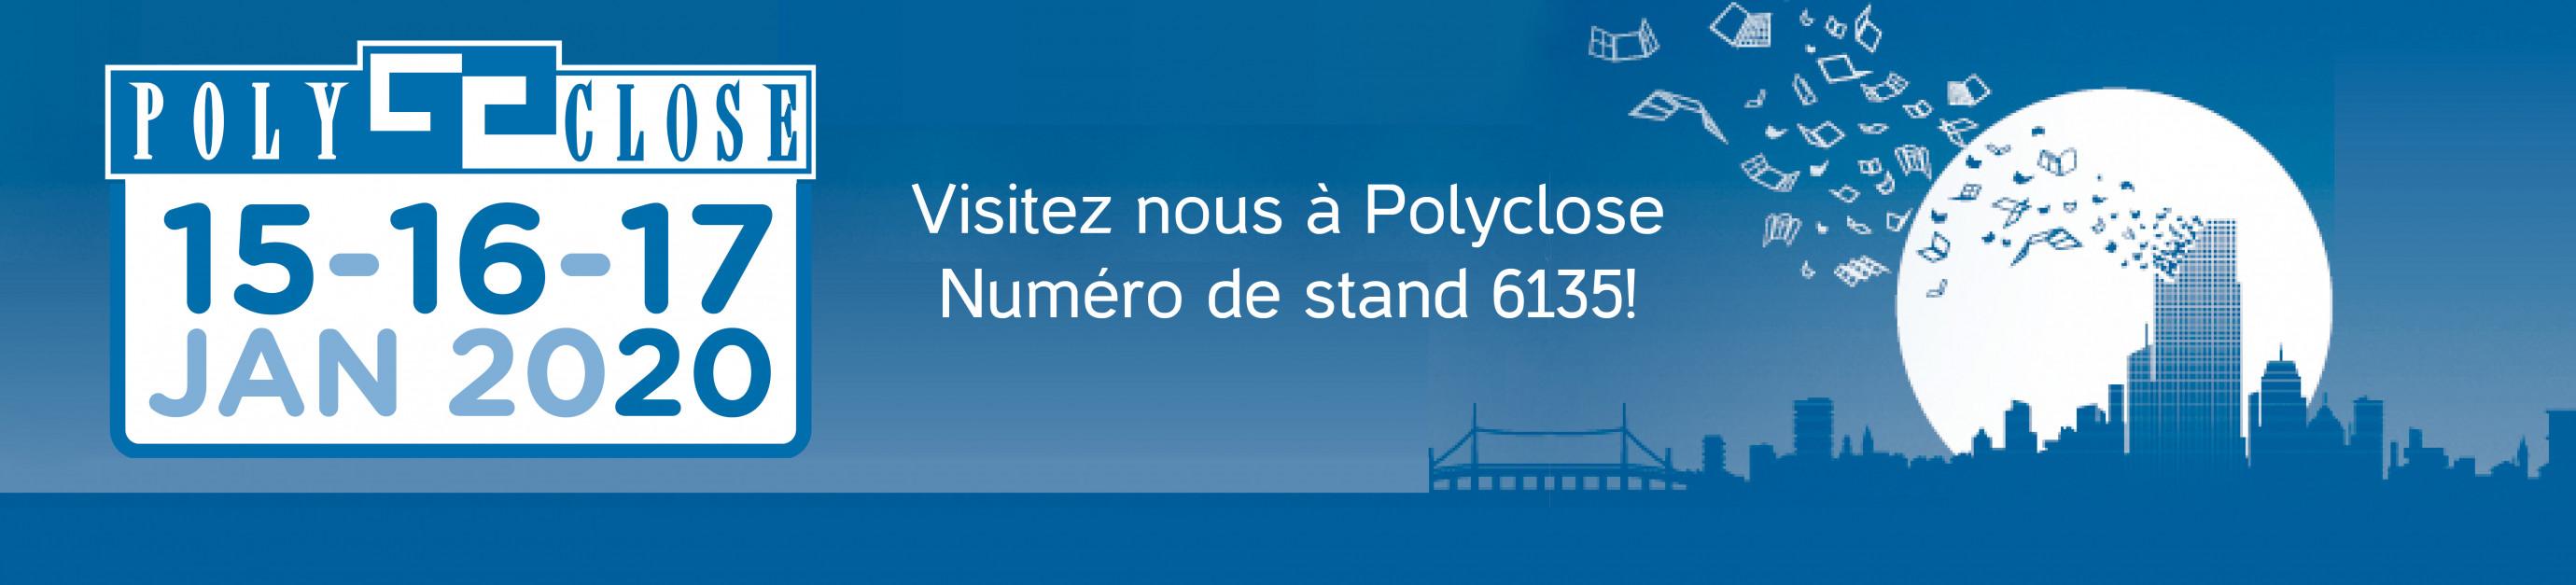 PolycloseFR20.jpg